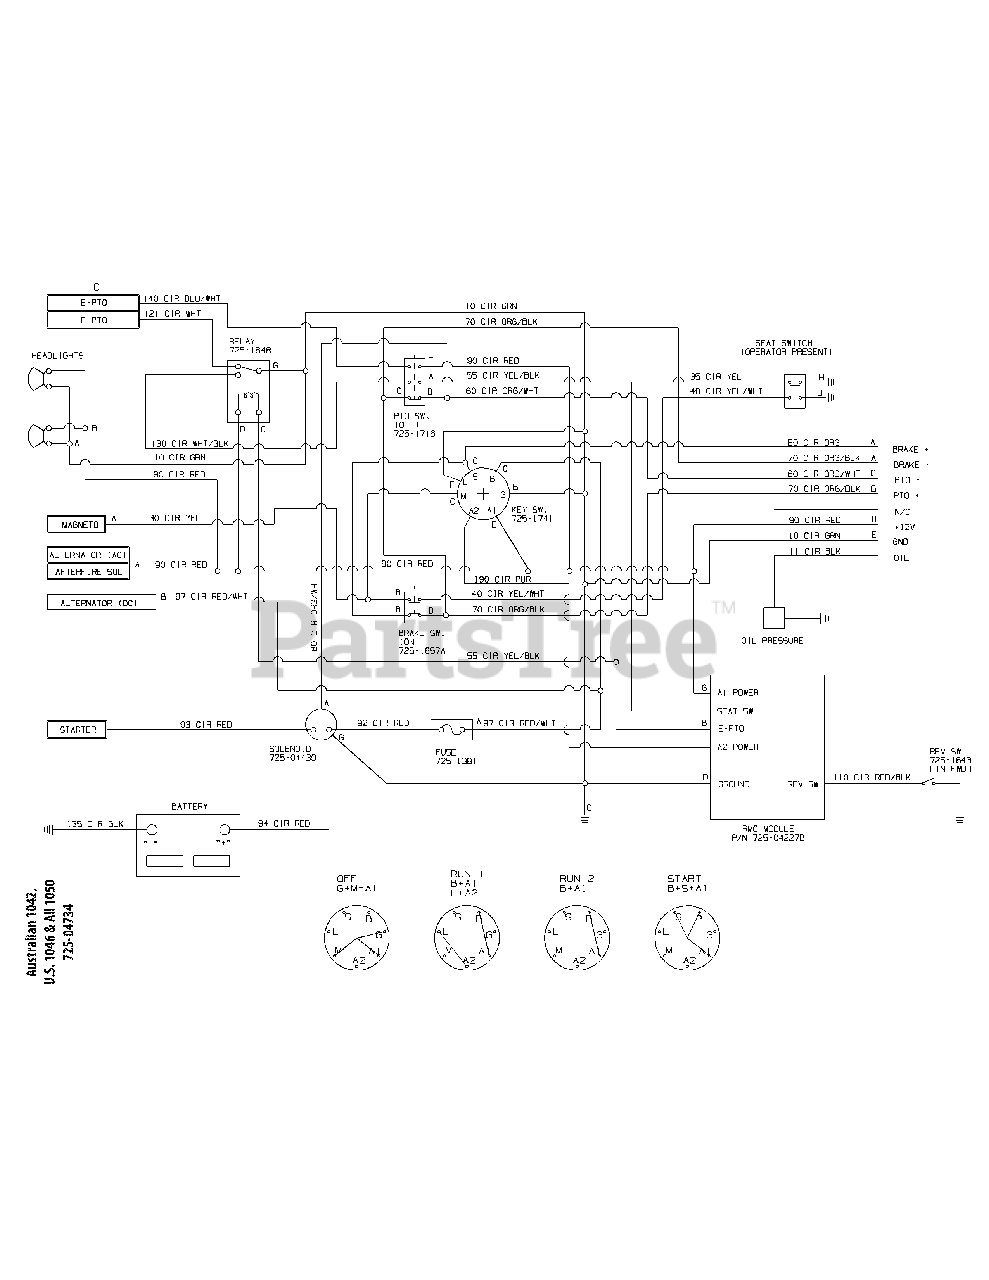 Diagram  Wiring Diagram For Cub Cadet Ltx 1050 Full